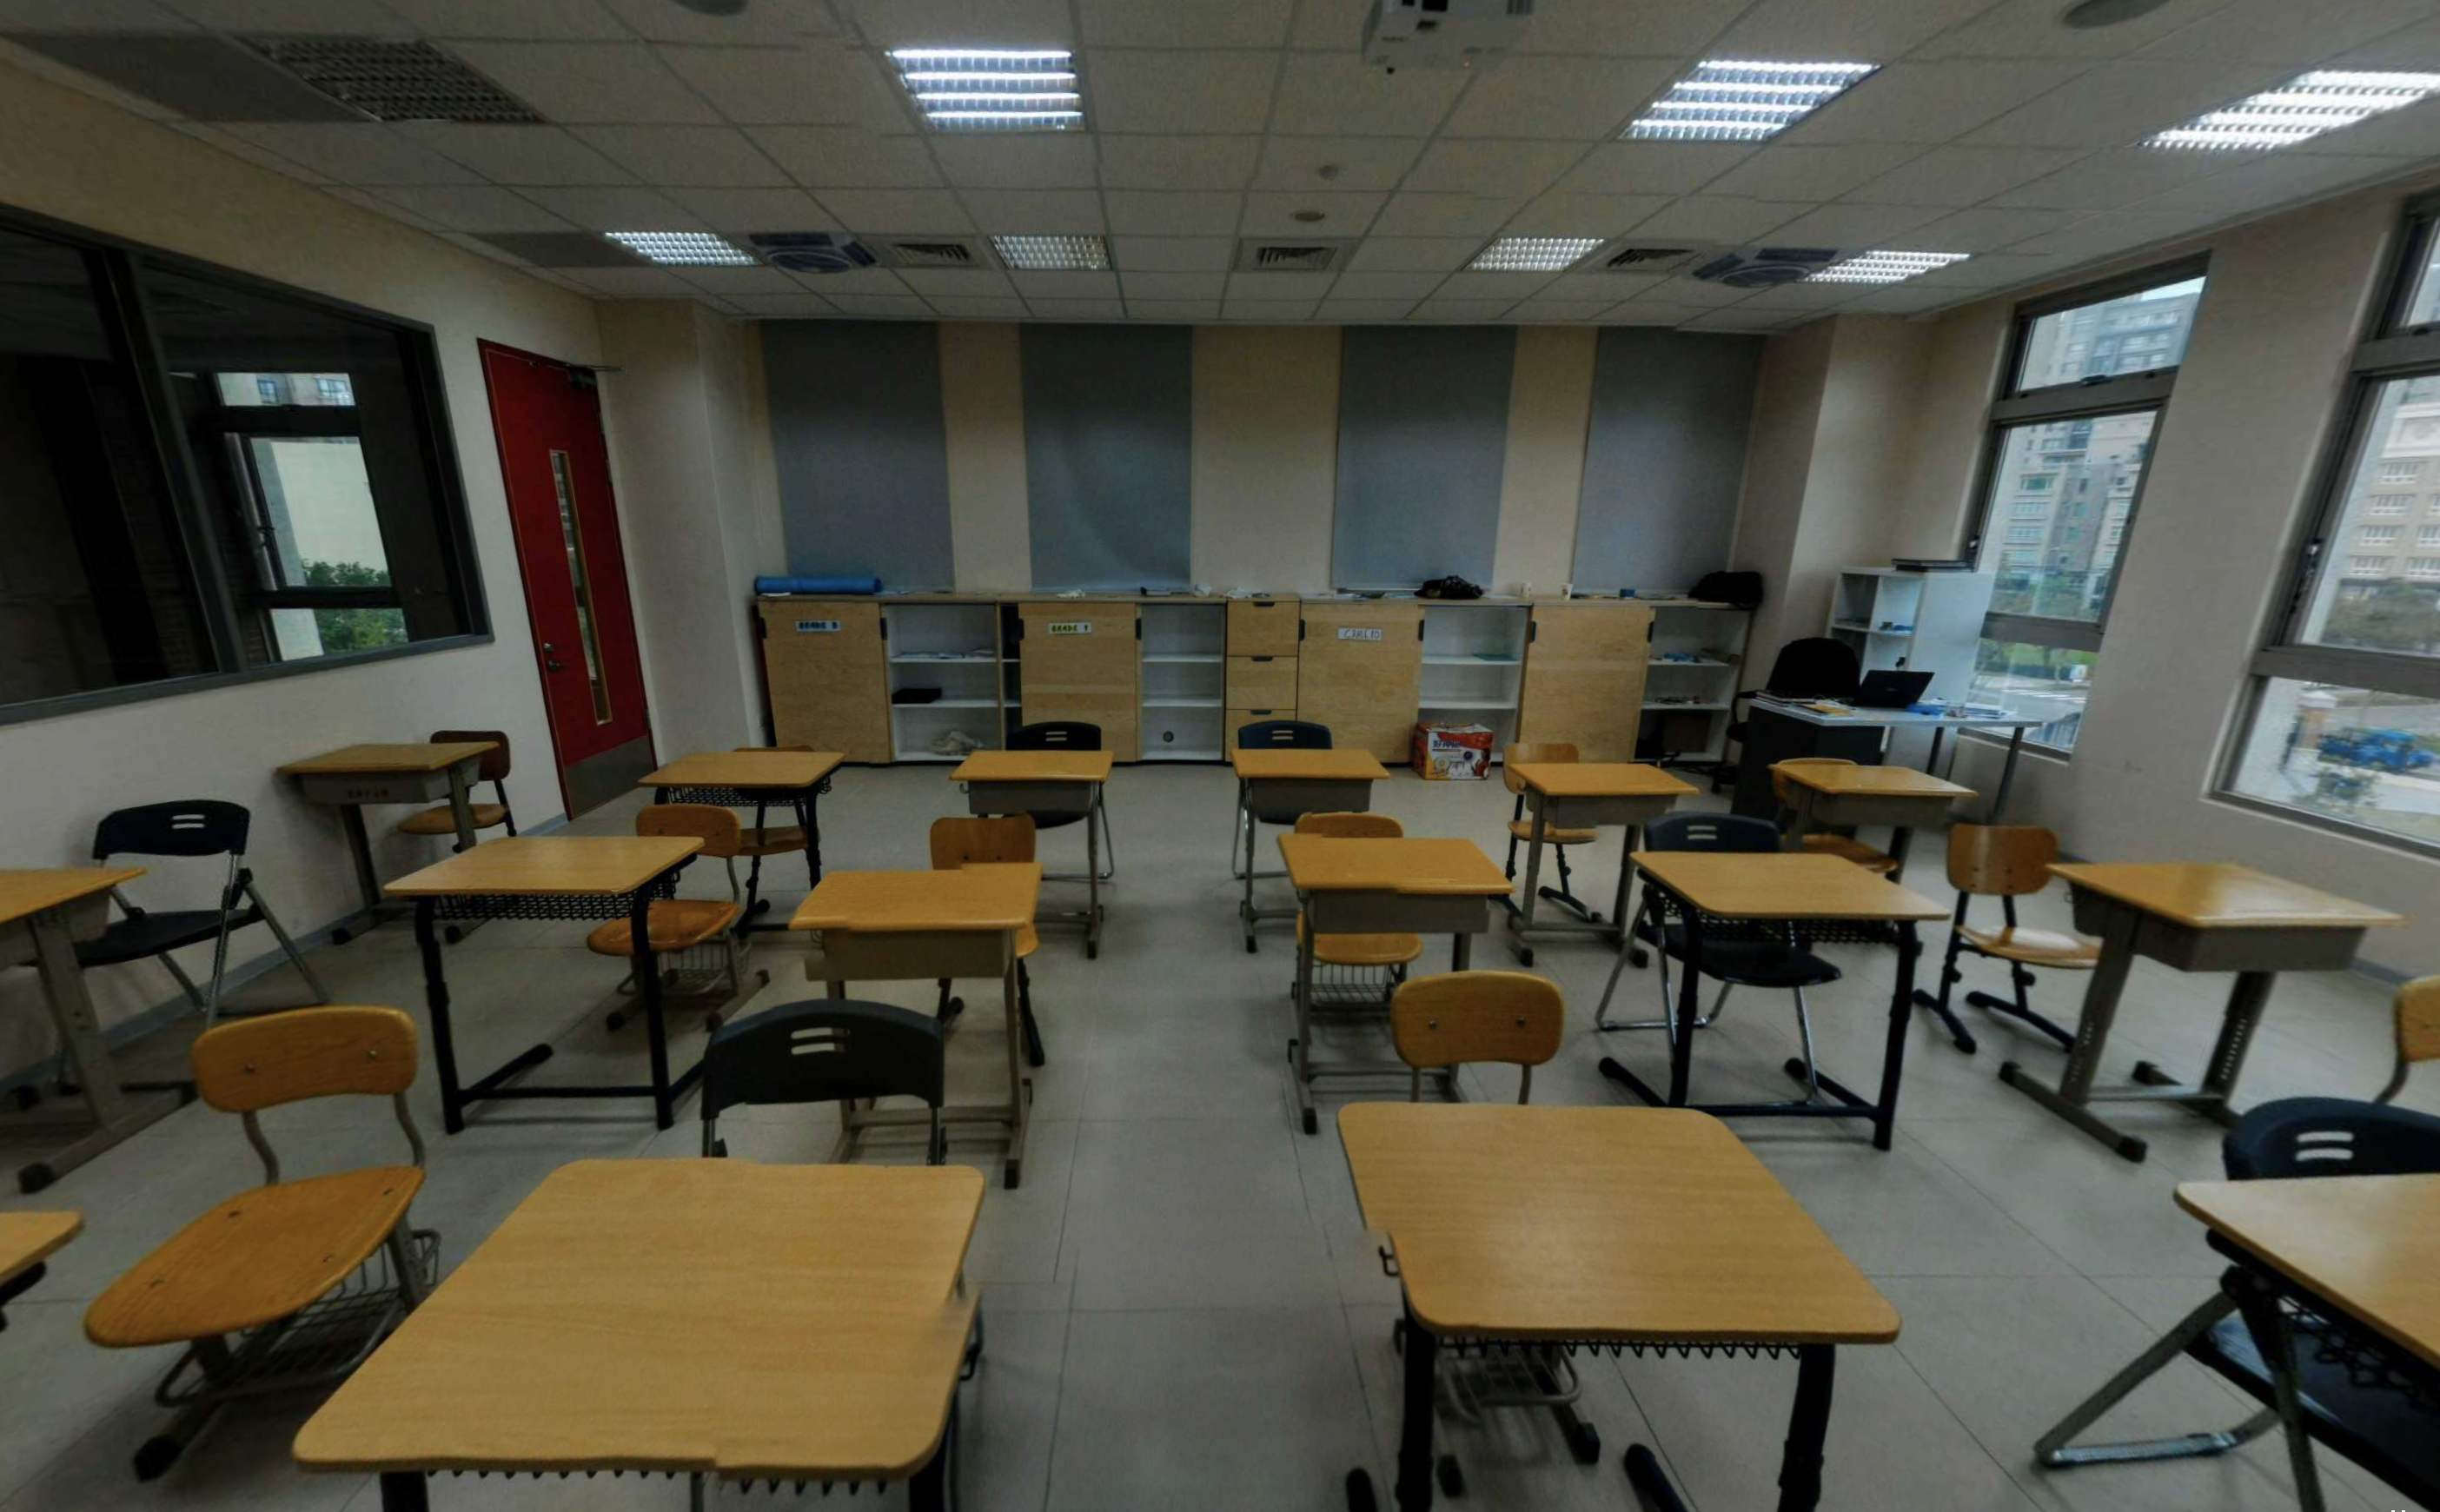 HCAS 新竹縣美國學校 - A LEAGUE 留學輔導 | 外僑學校 | 台灣國際學校 | 雙語班 | 國際班 | 申請美國大學